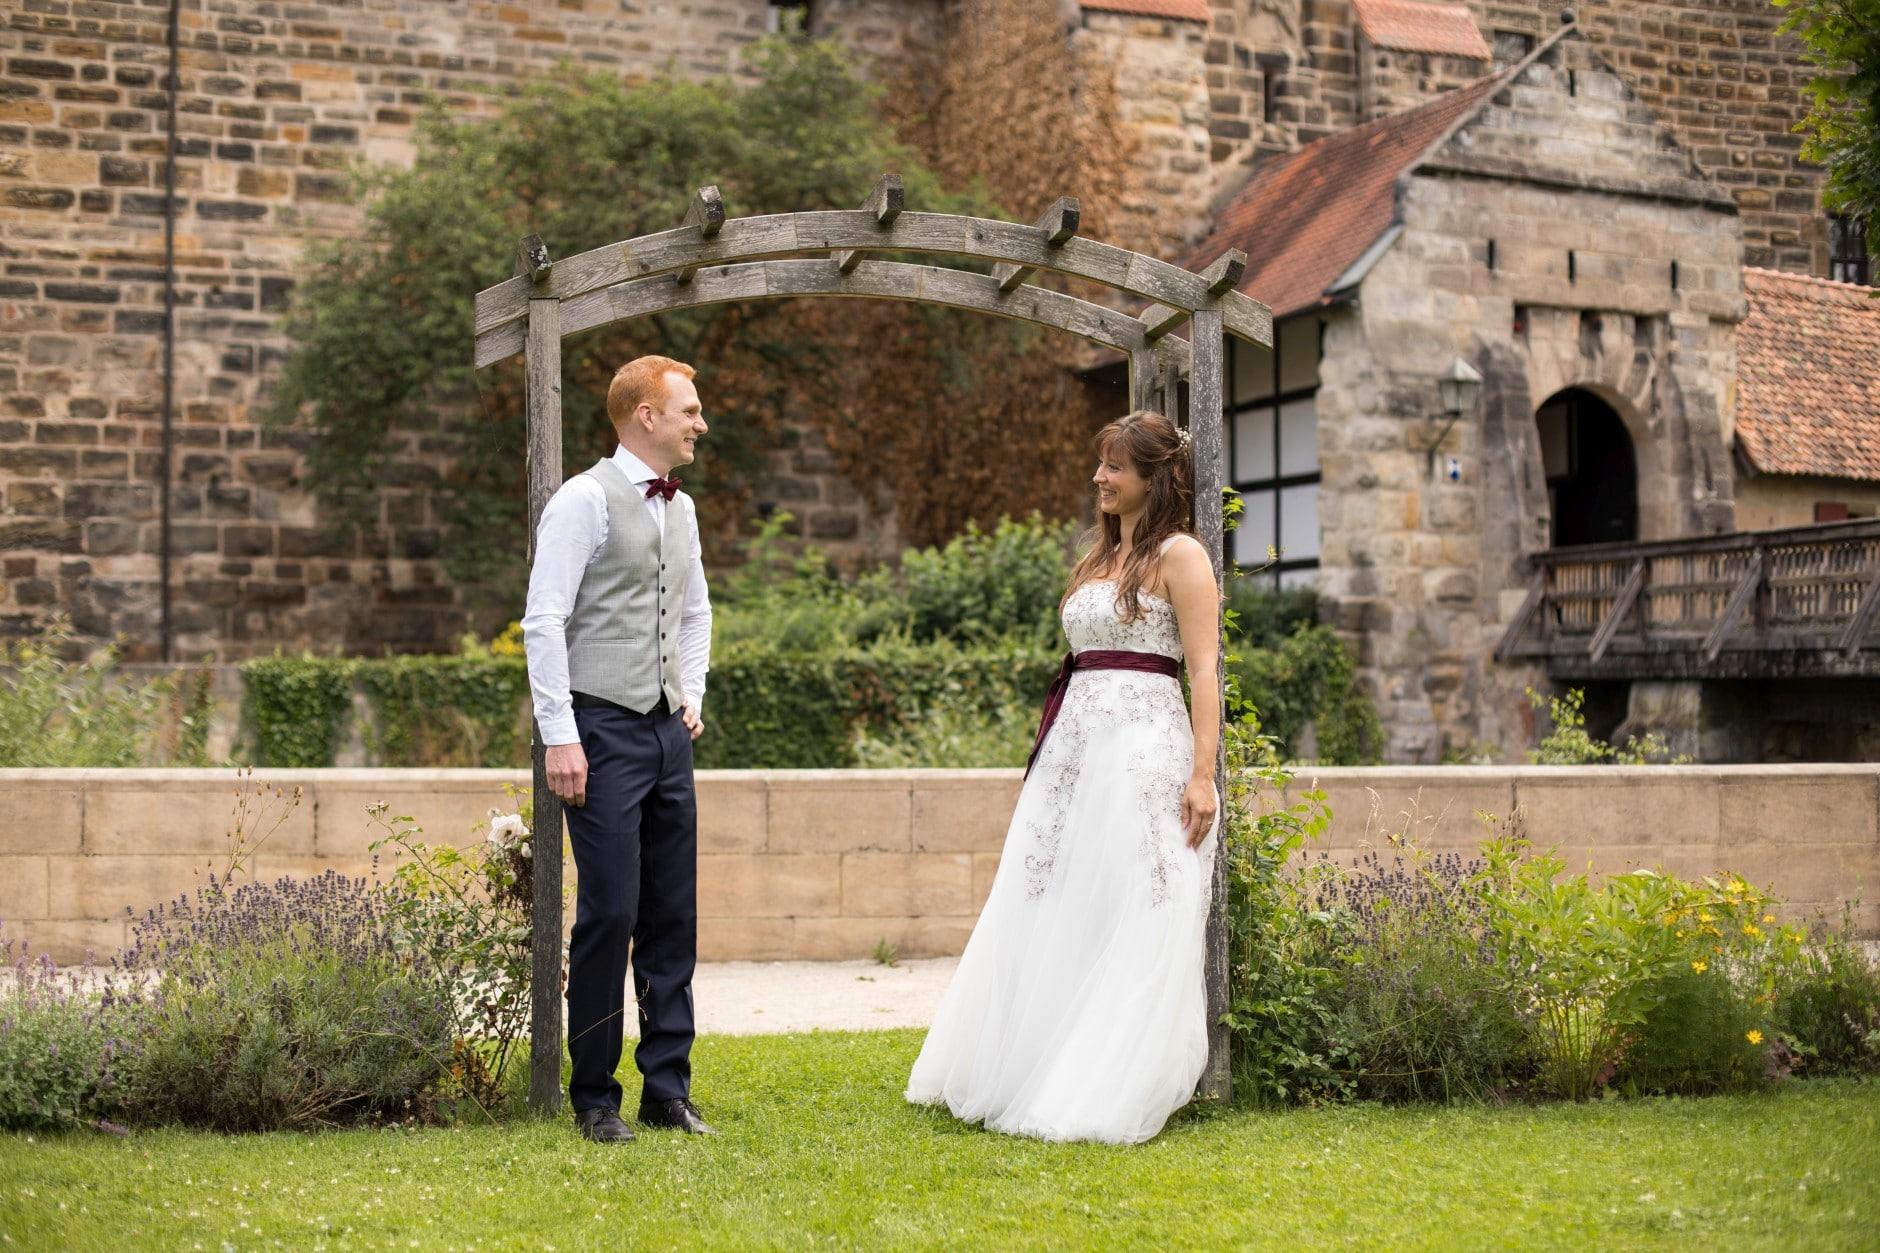 Hochzeitsfotograf Wenzelschloss